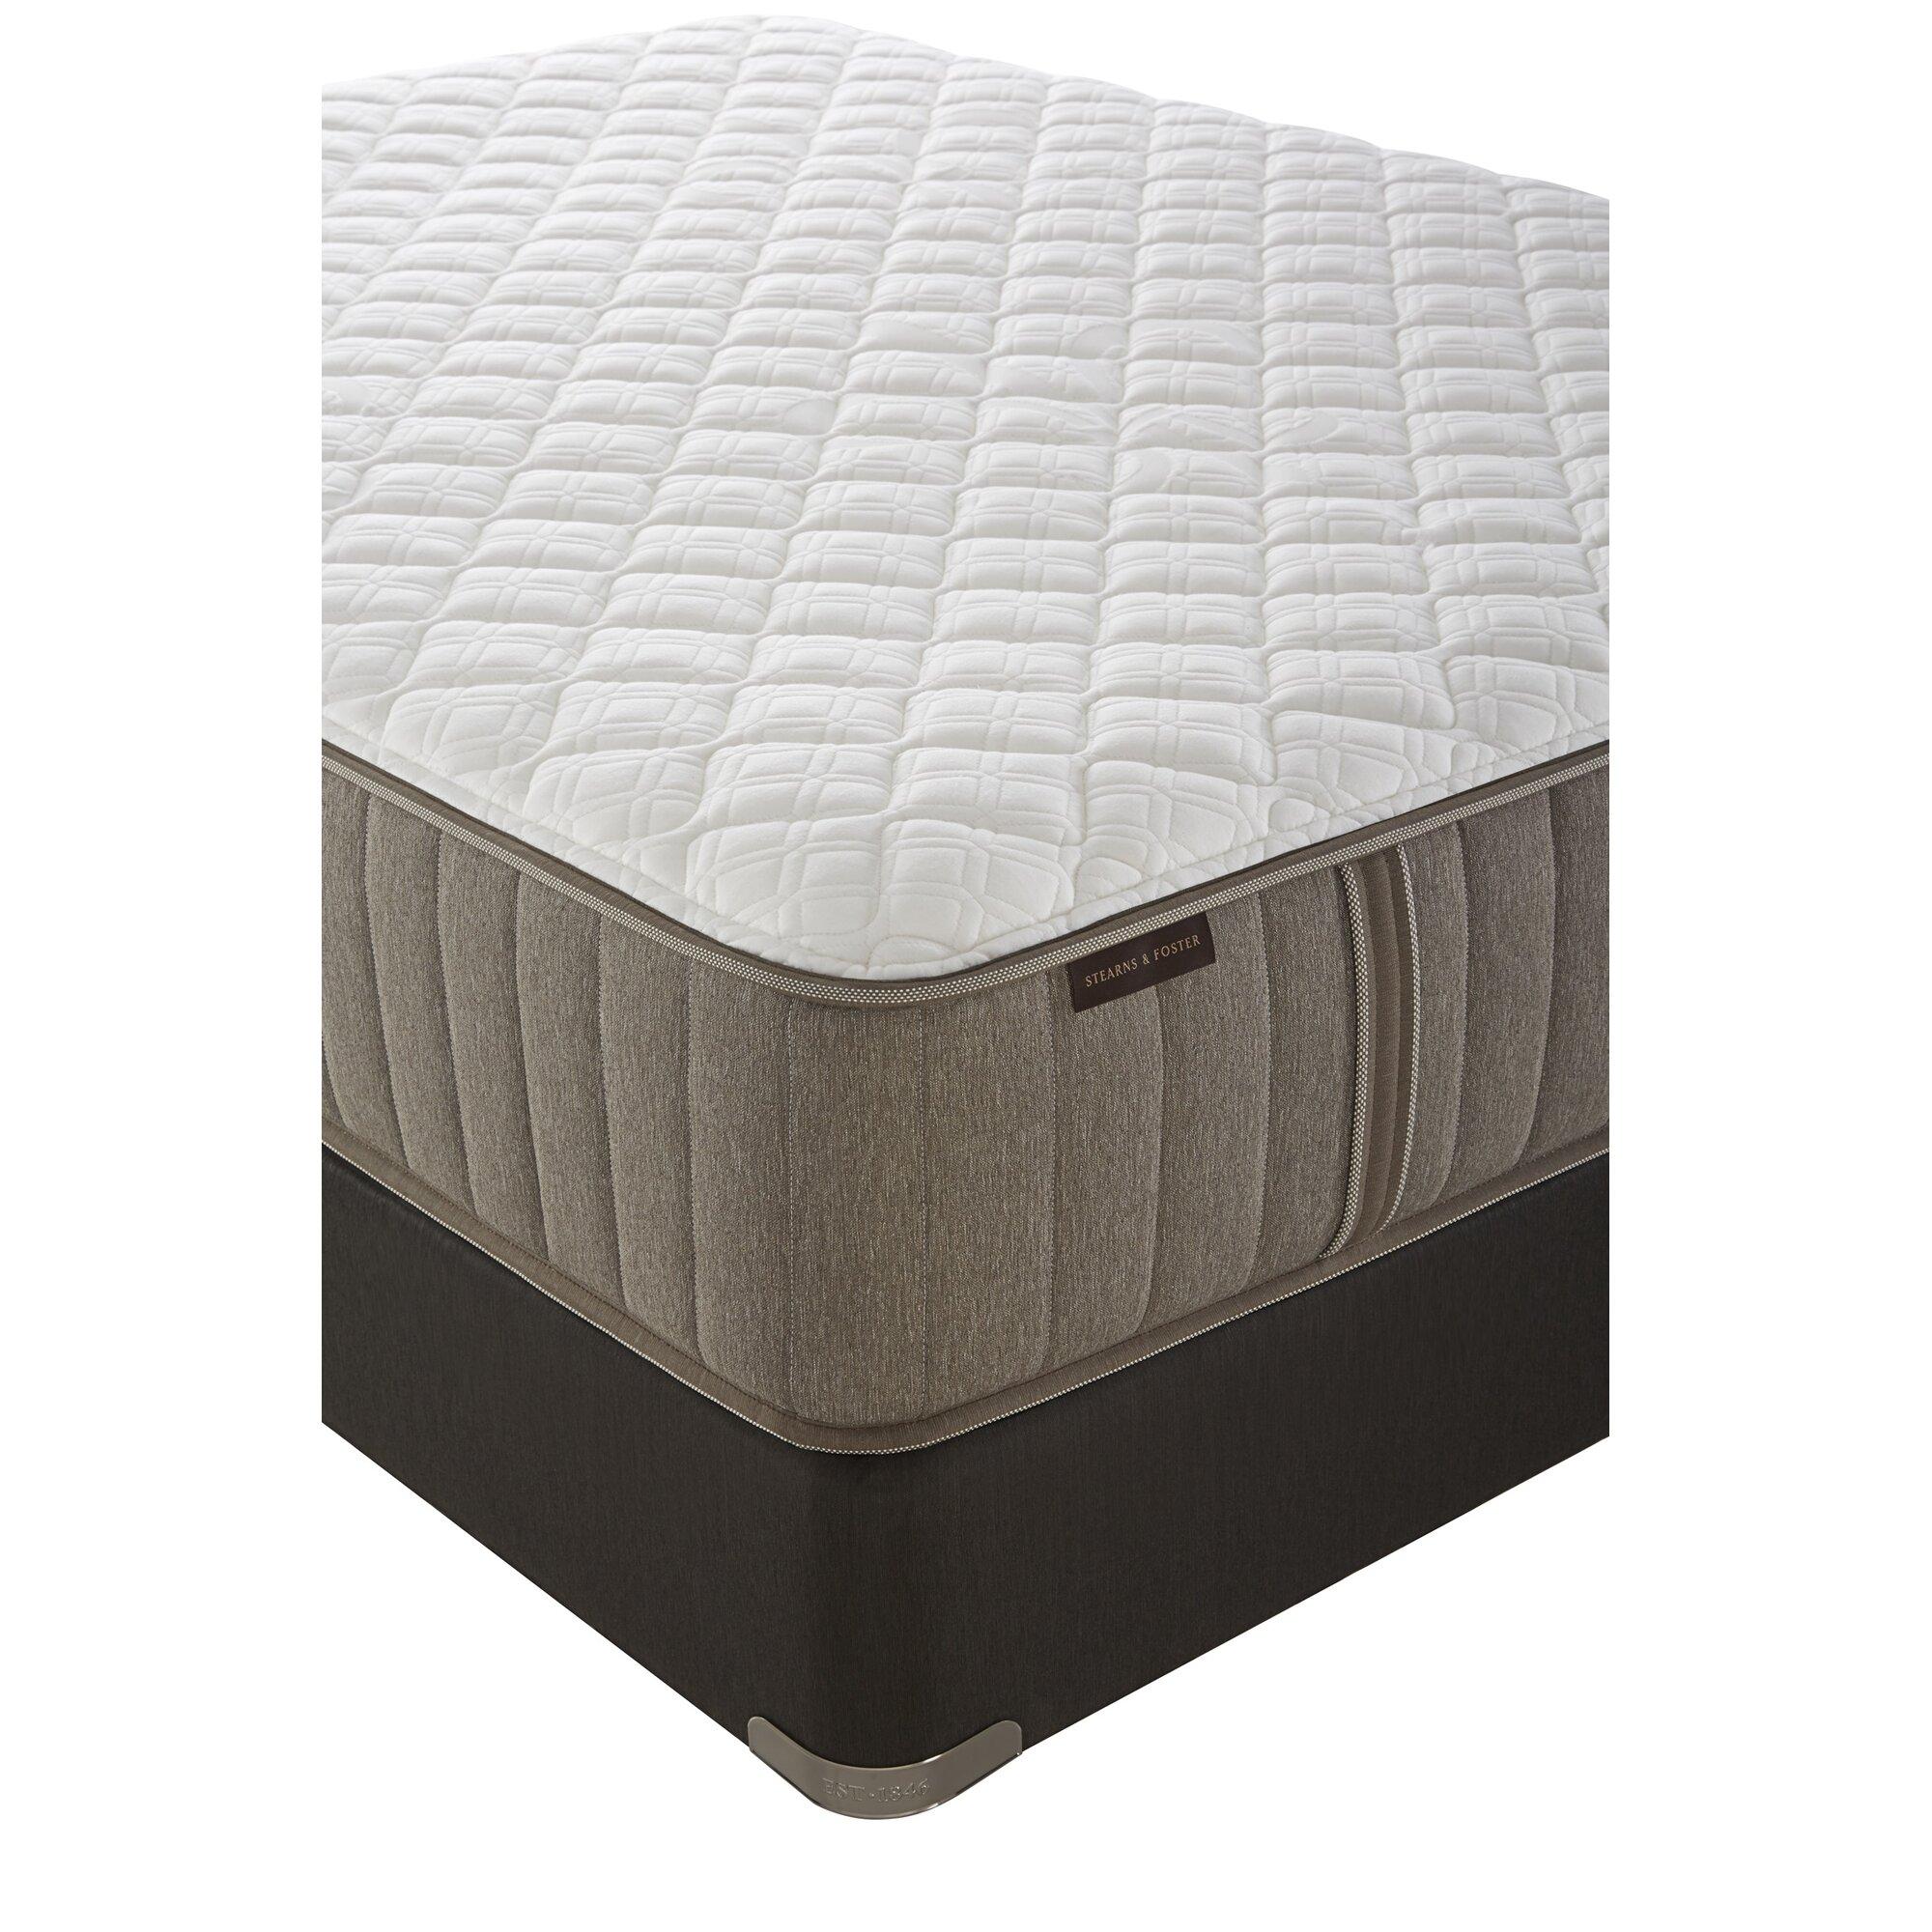 firm mattress topper orthopedic supreme firm mattress set this set includes mattress u0026 box. Black Bedroom Furniture Sets. Home Design Ideas